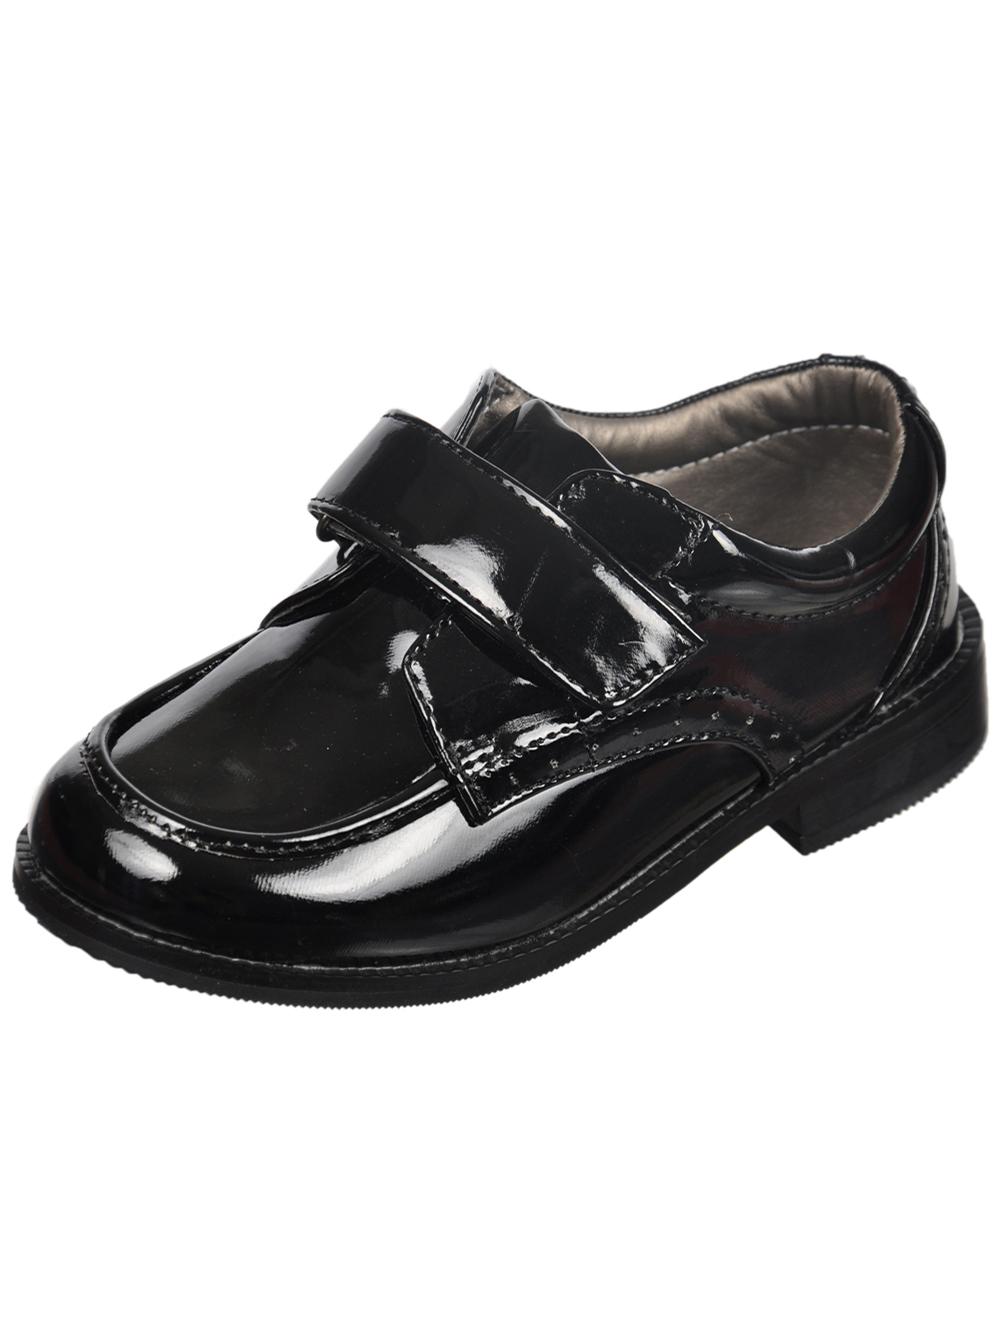 Image of Josmo Oreille Brogue Dress Shoes Toddler Boys Sizes 5  12  black 11 toddler